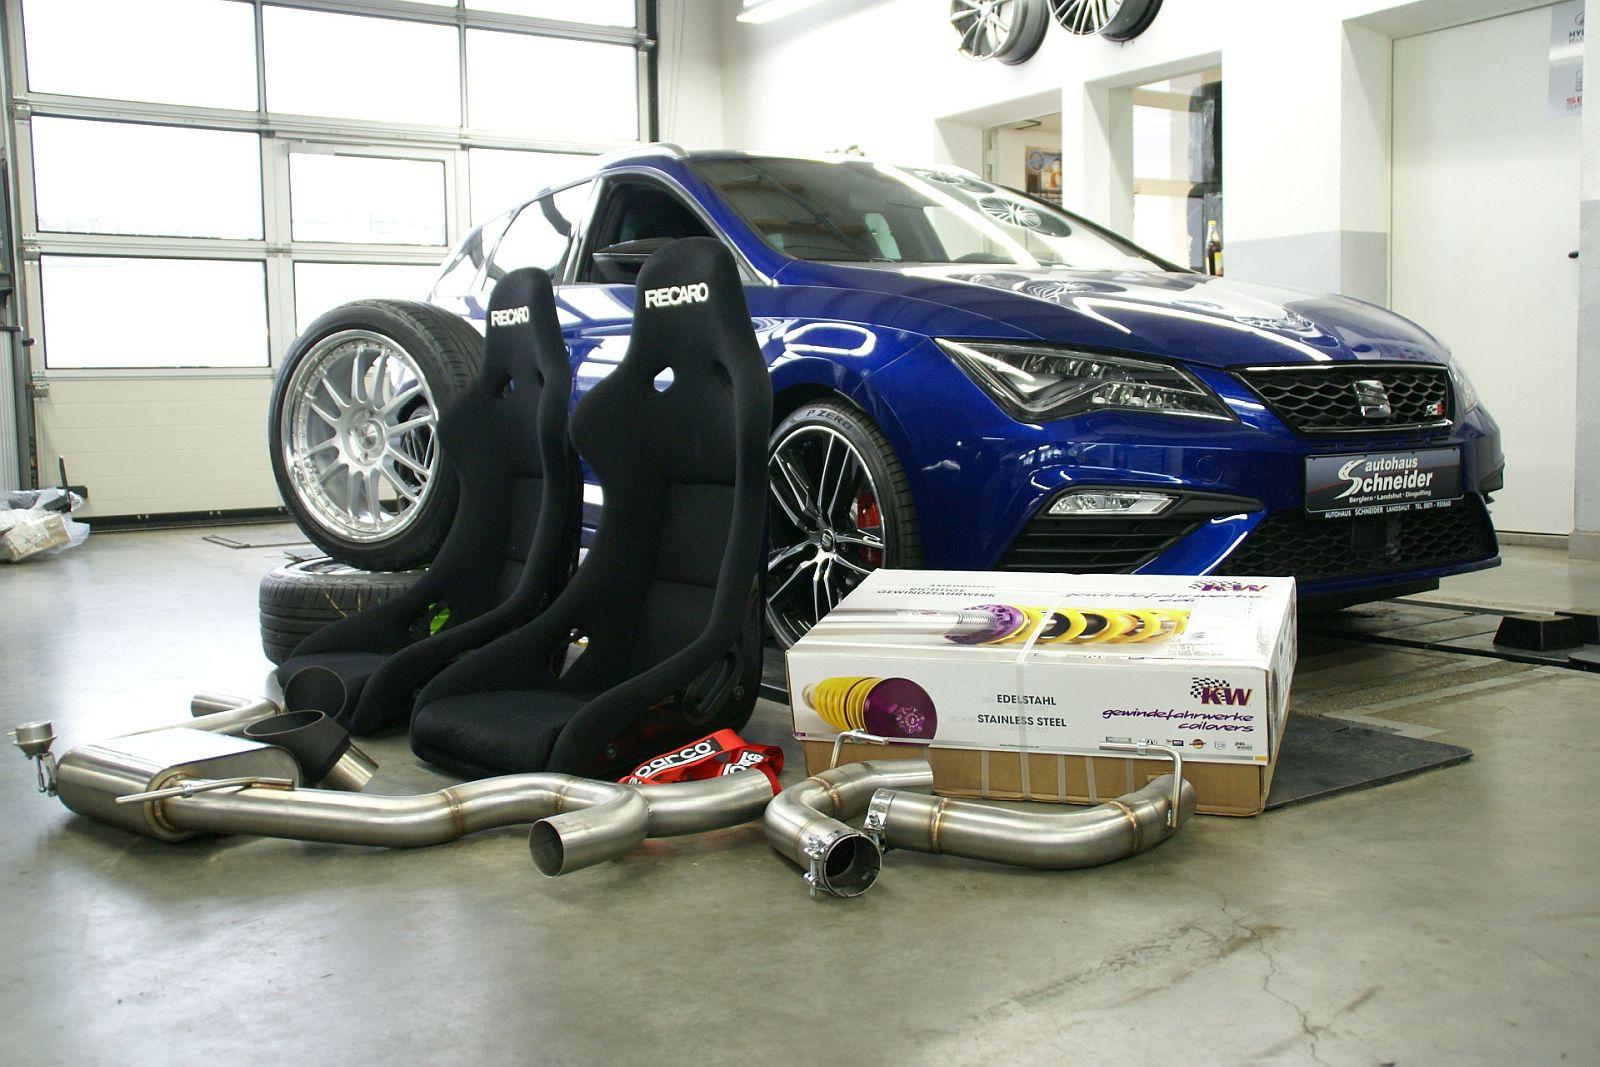 Seat Leon Cupra Allrad ST400 R Schneider Tuning